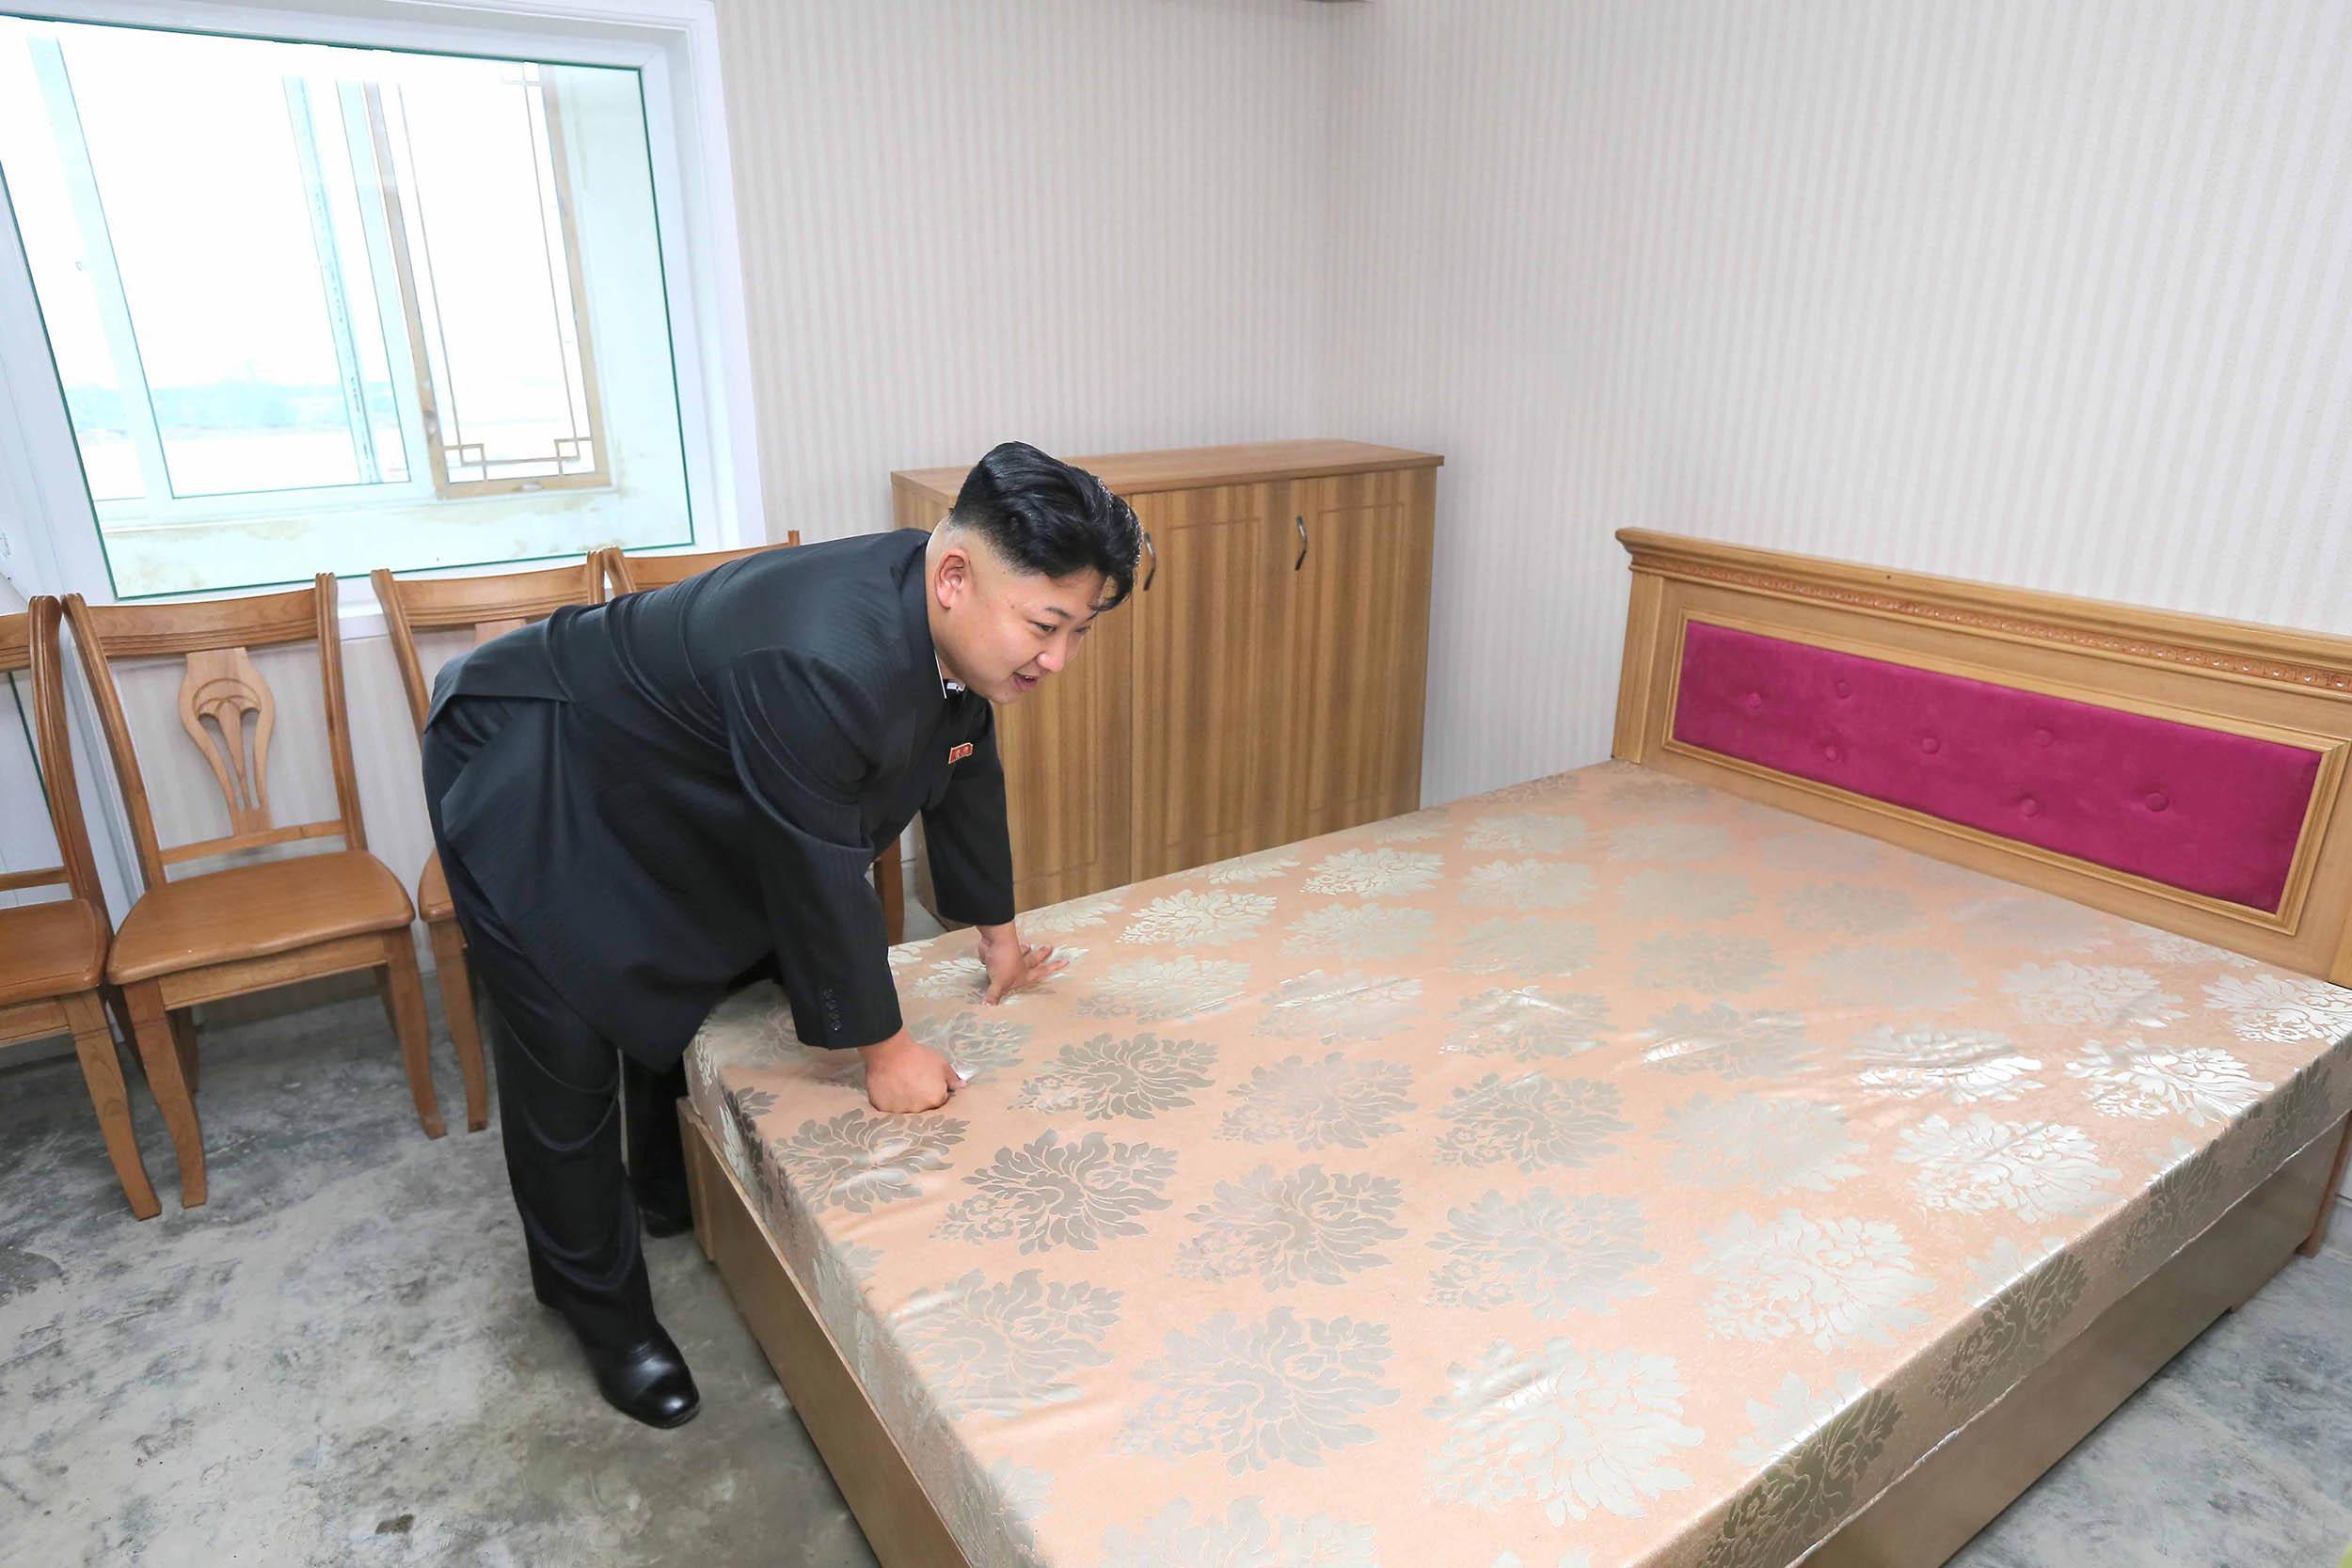 Kim Jong Un North Korea Furniture Floor Room Table Flooring Bed